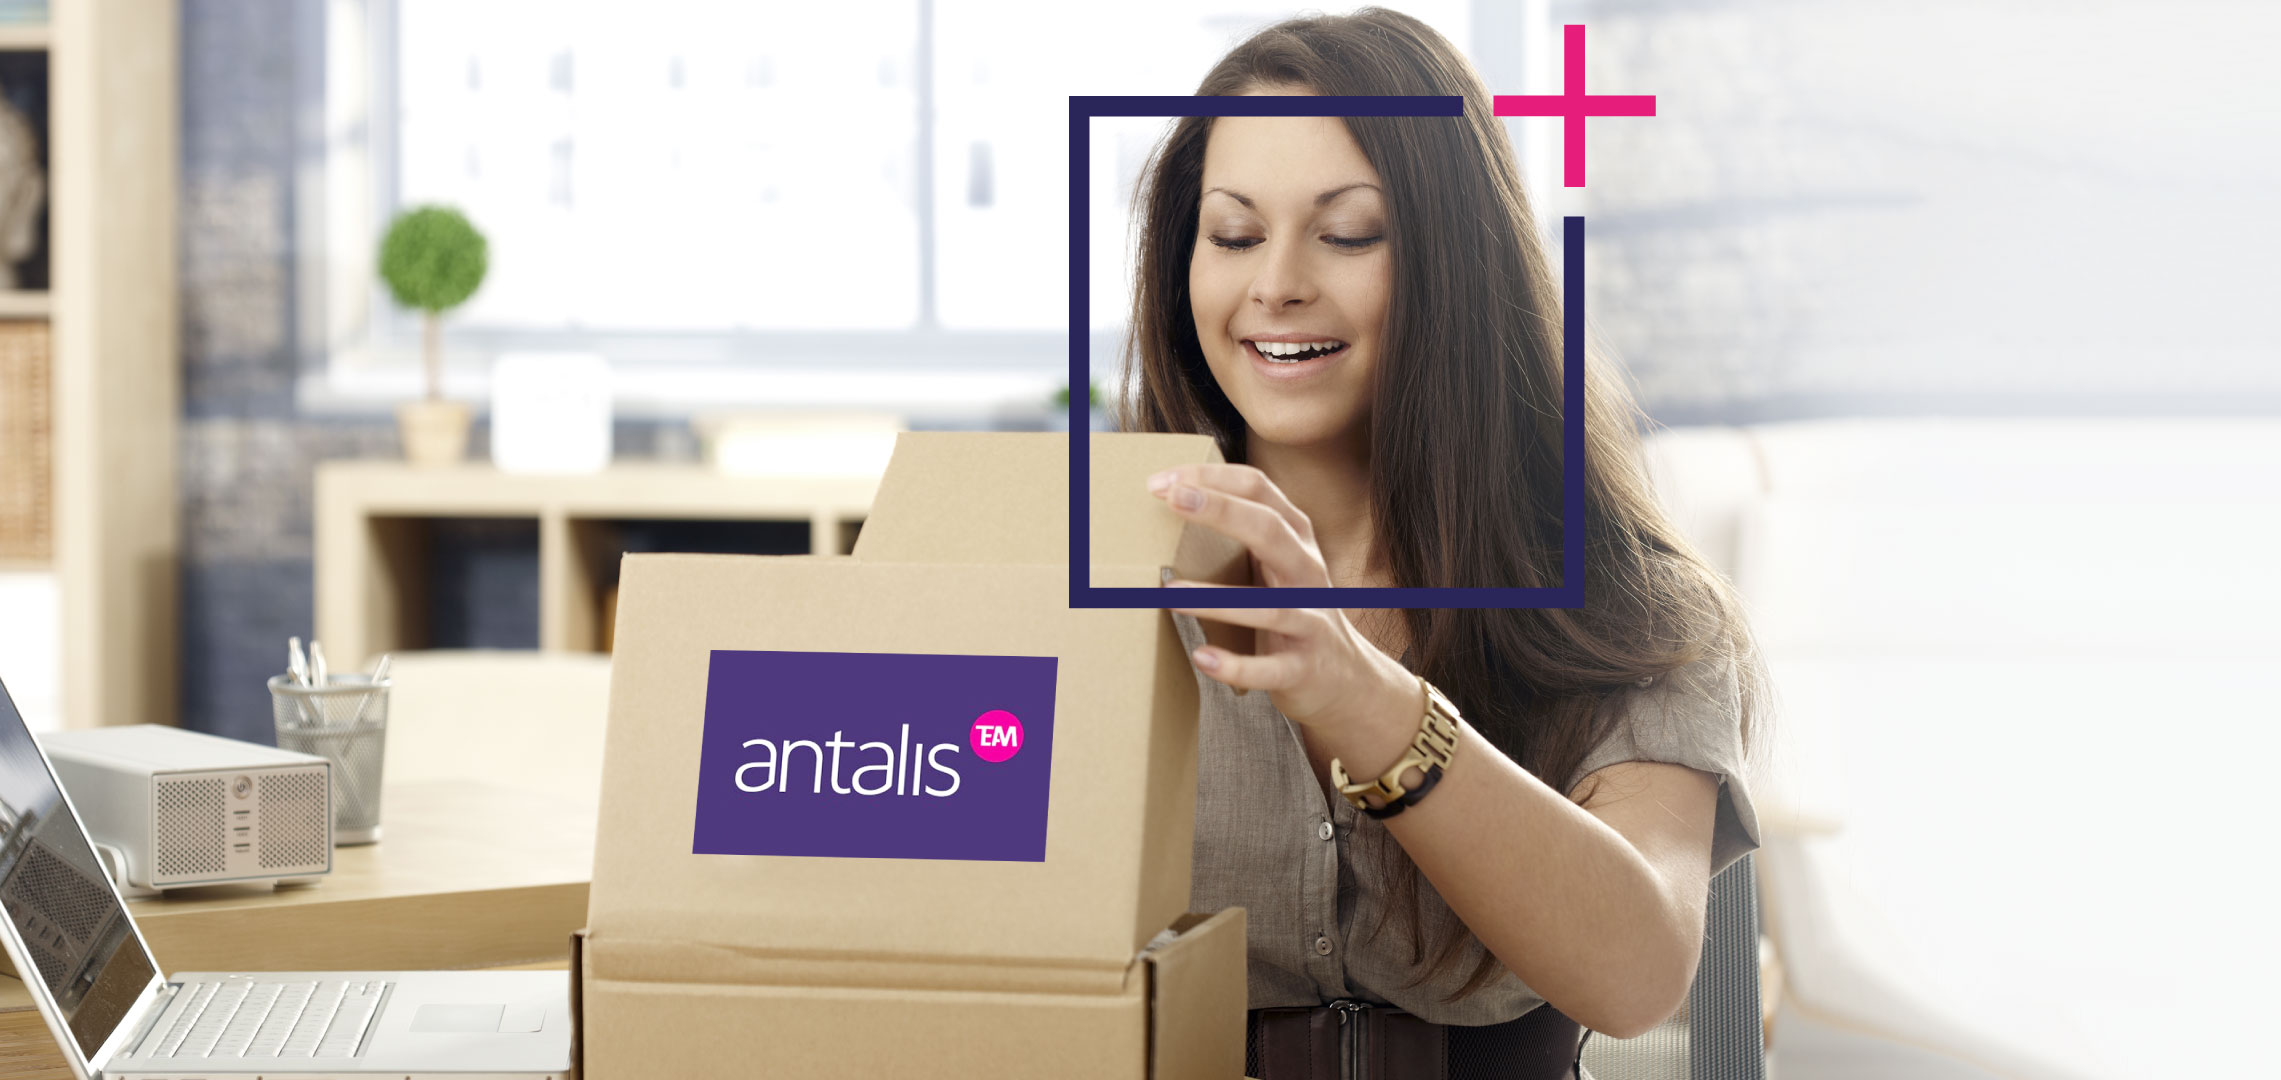 women-opening-antalis-package